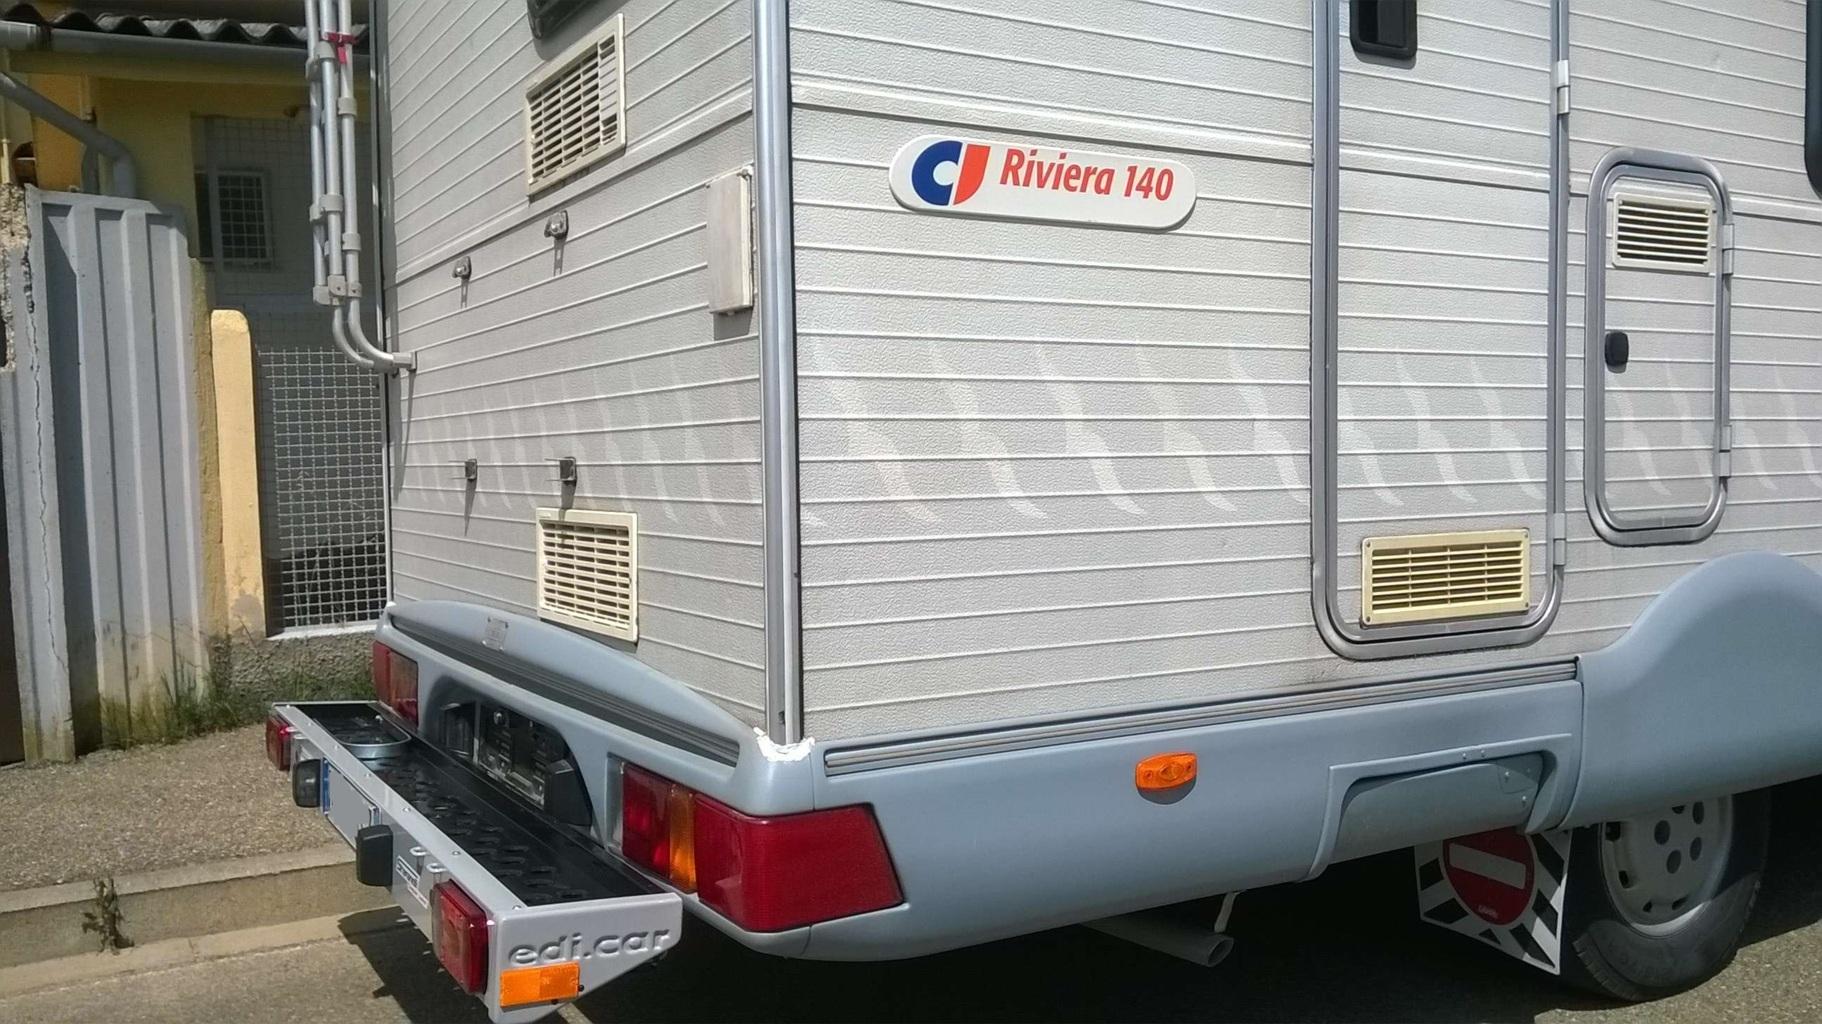 03-Caravan-International-Riviera-140